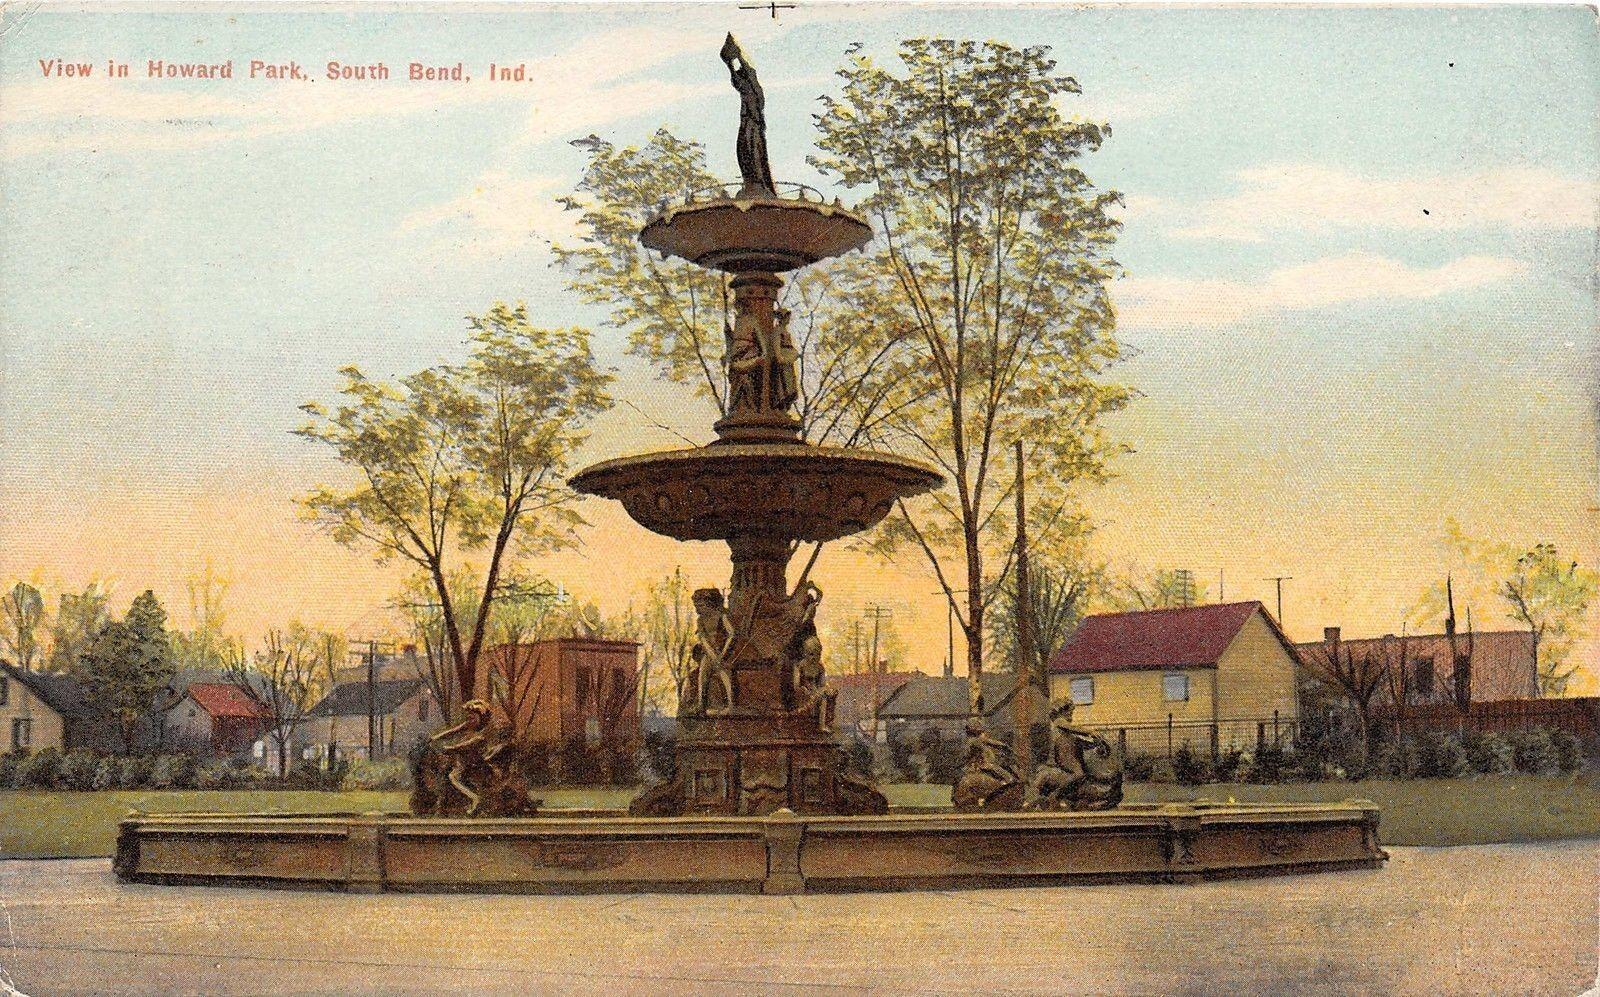 Postcard of Studebaker Fountain in Howard Park